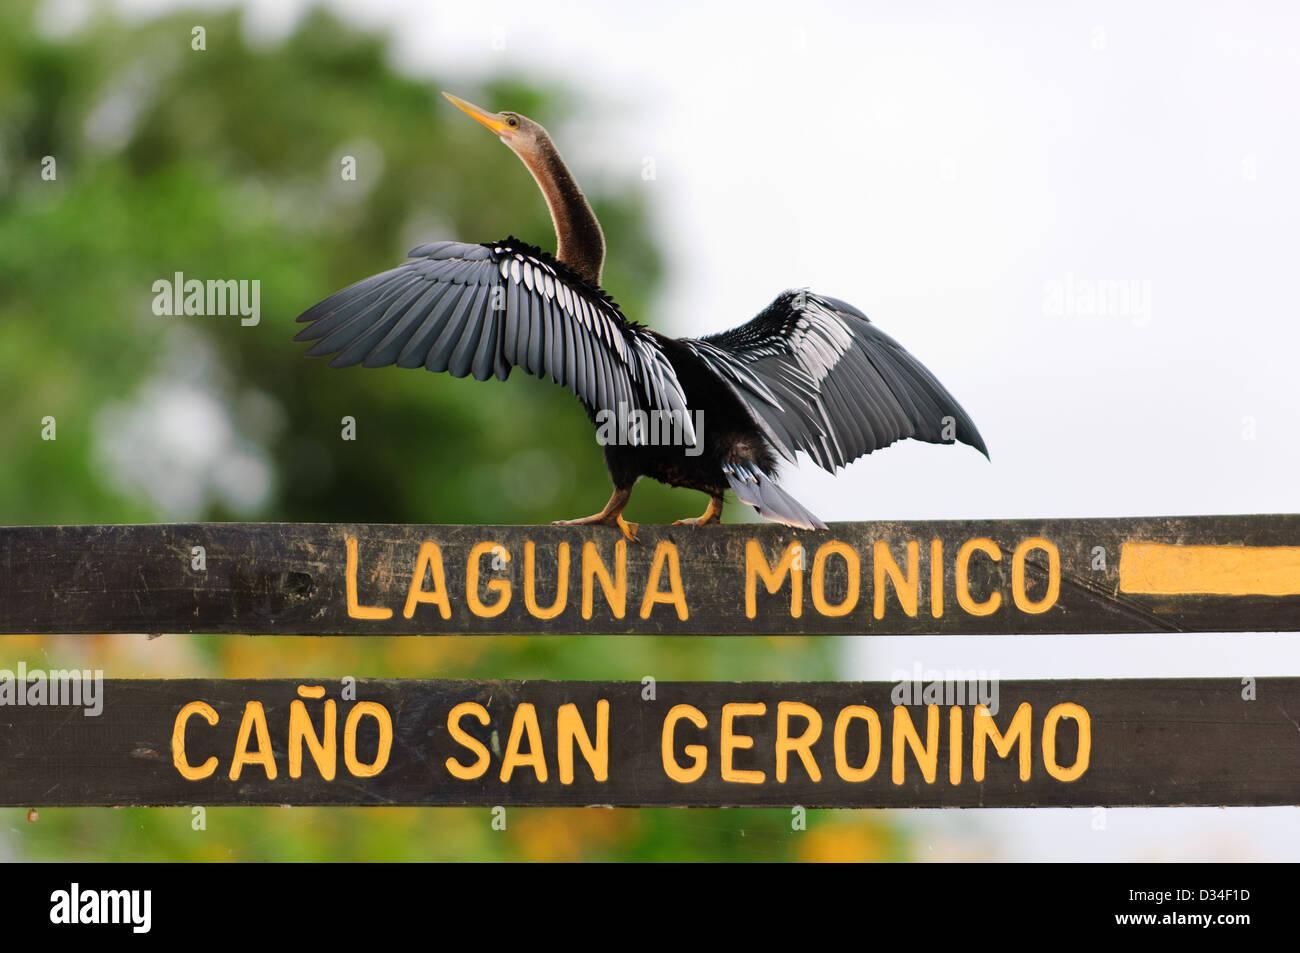 Anhinga (Anhinga anhinga) drying its wings on a signpost in Caño Negro Wildlife Refuge. Costa Rica. - Stock Image